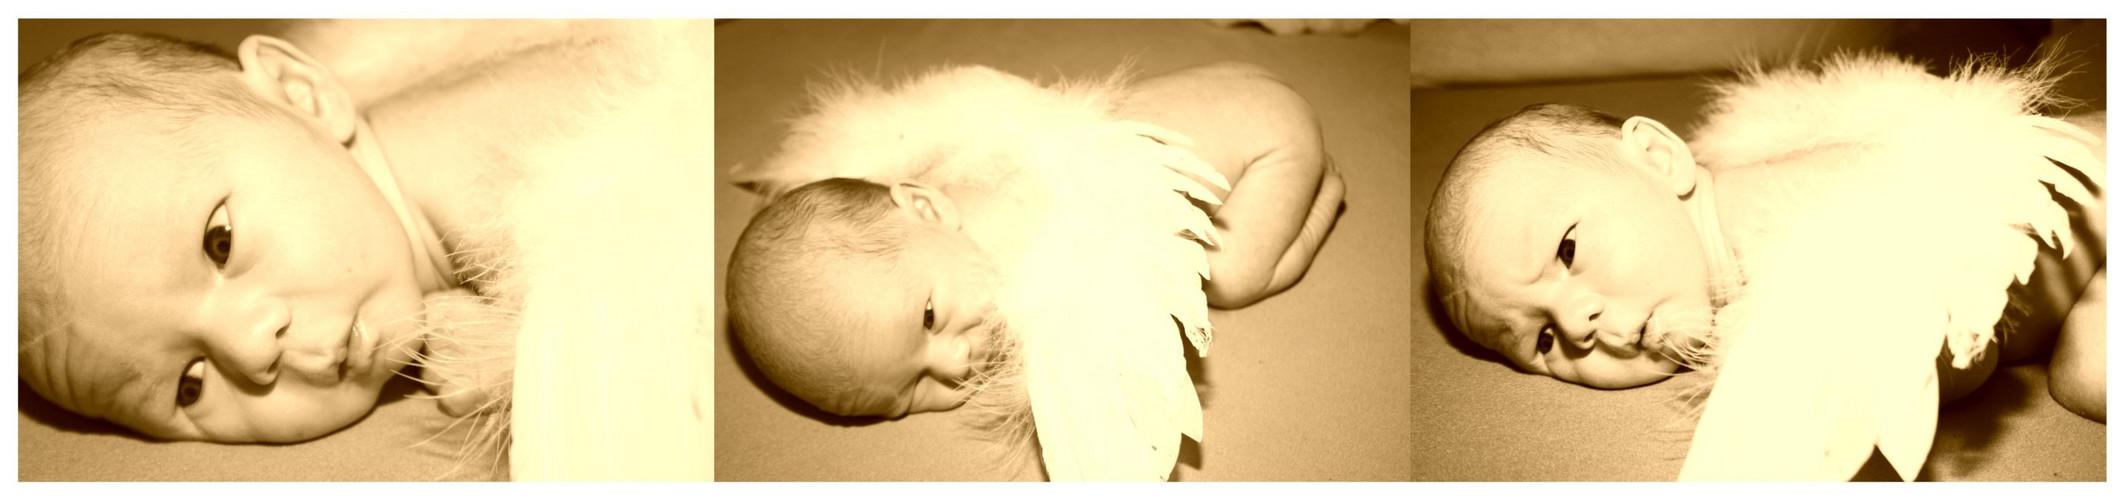 Angel on earth,....